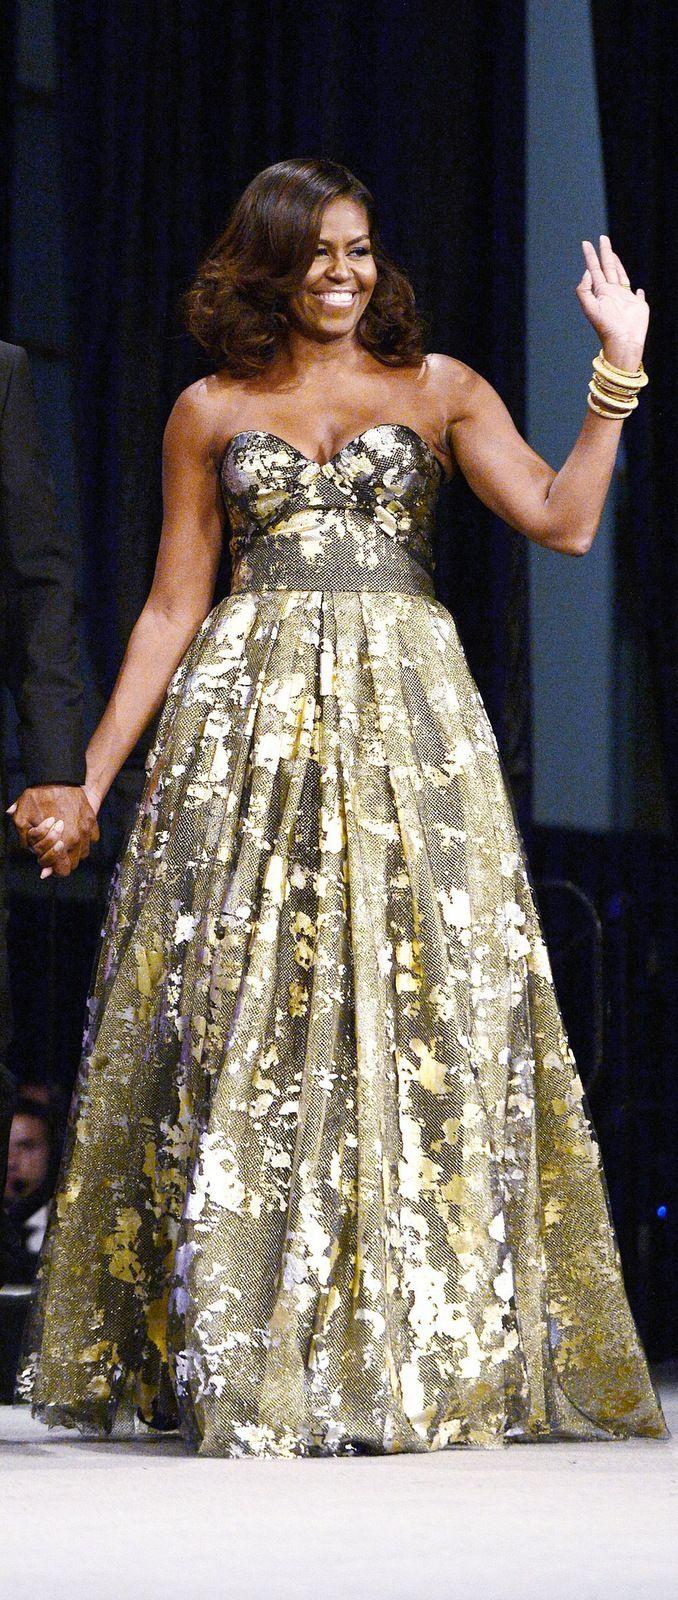 Michelle Obama in Naeem Khan                                                                                                                                                                                 More